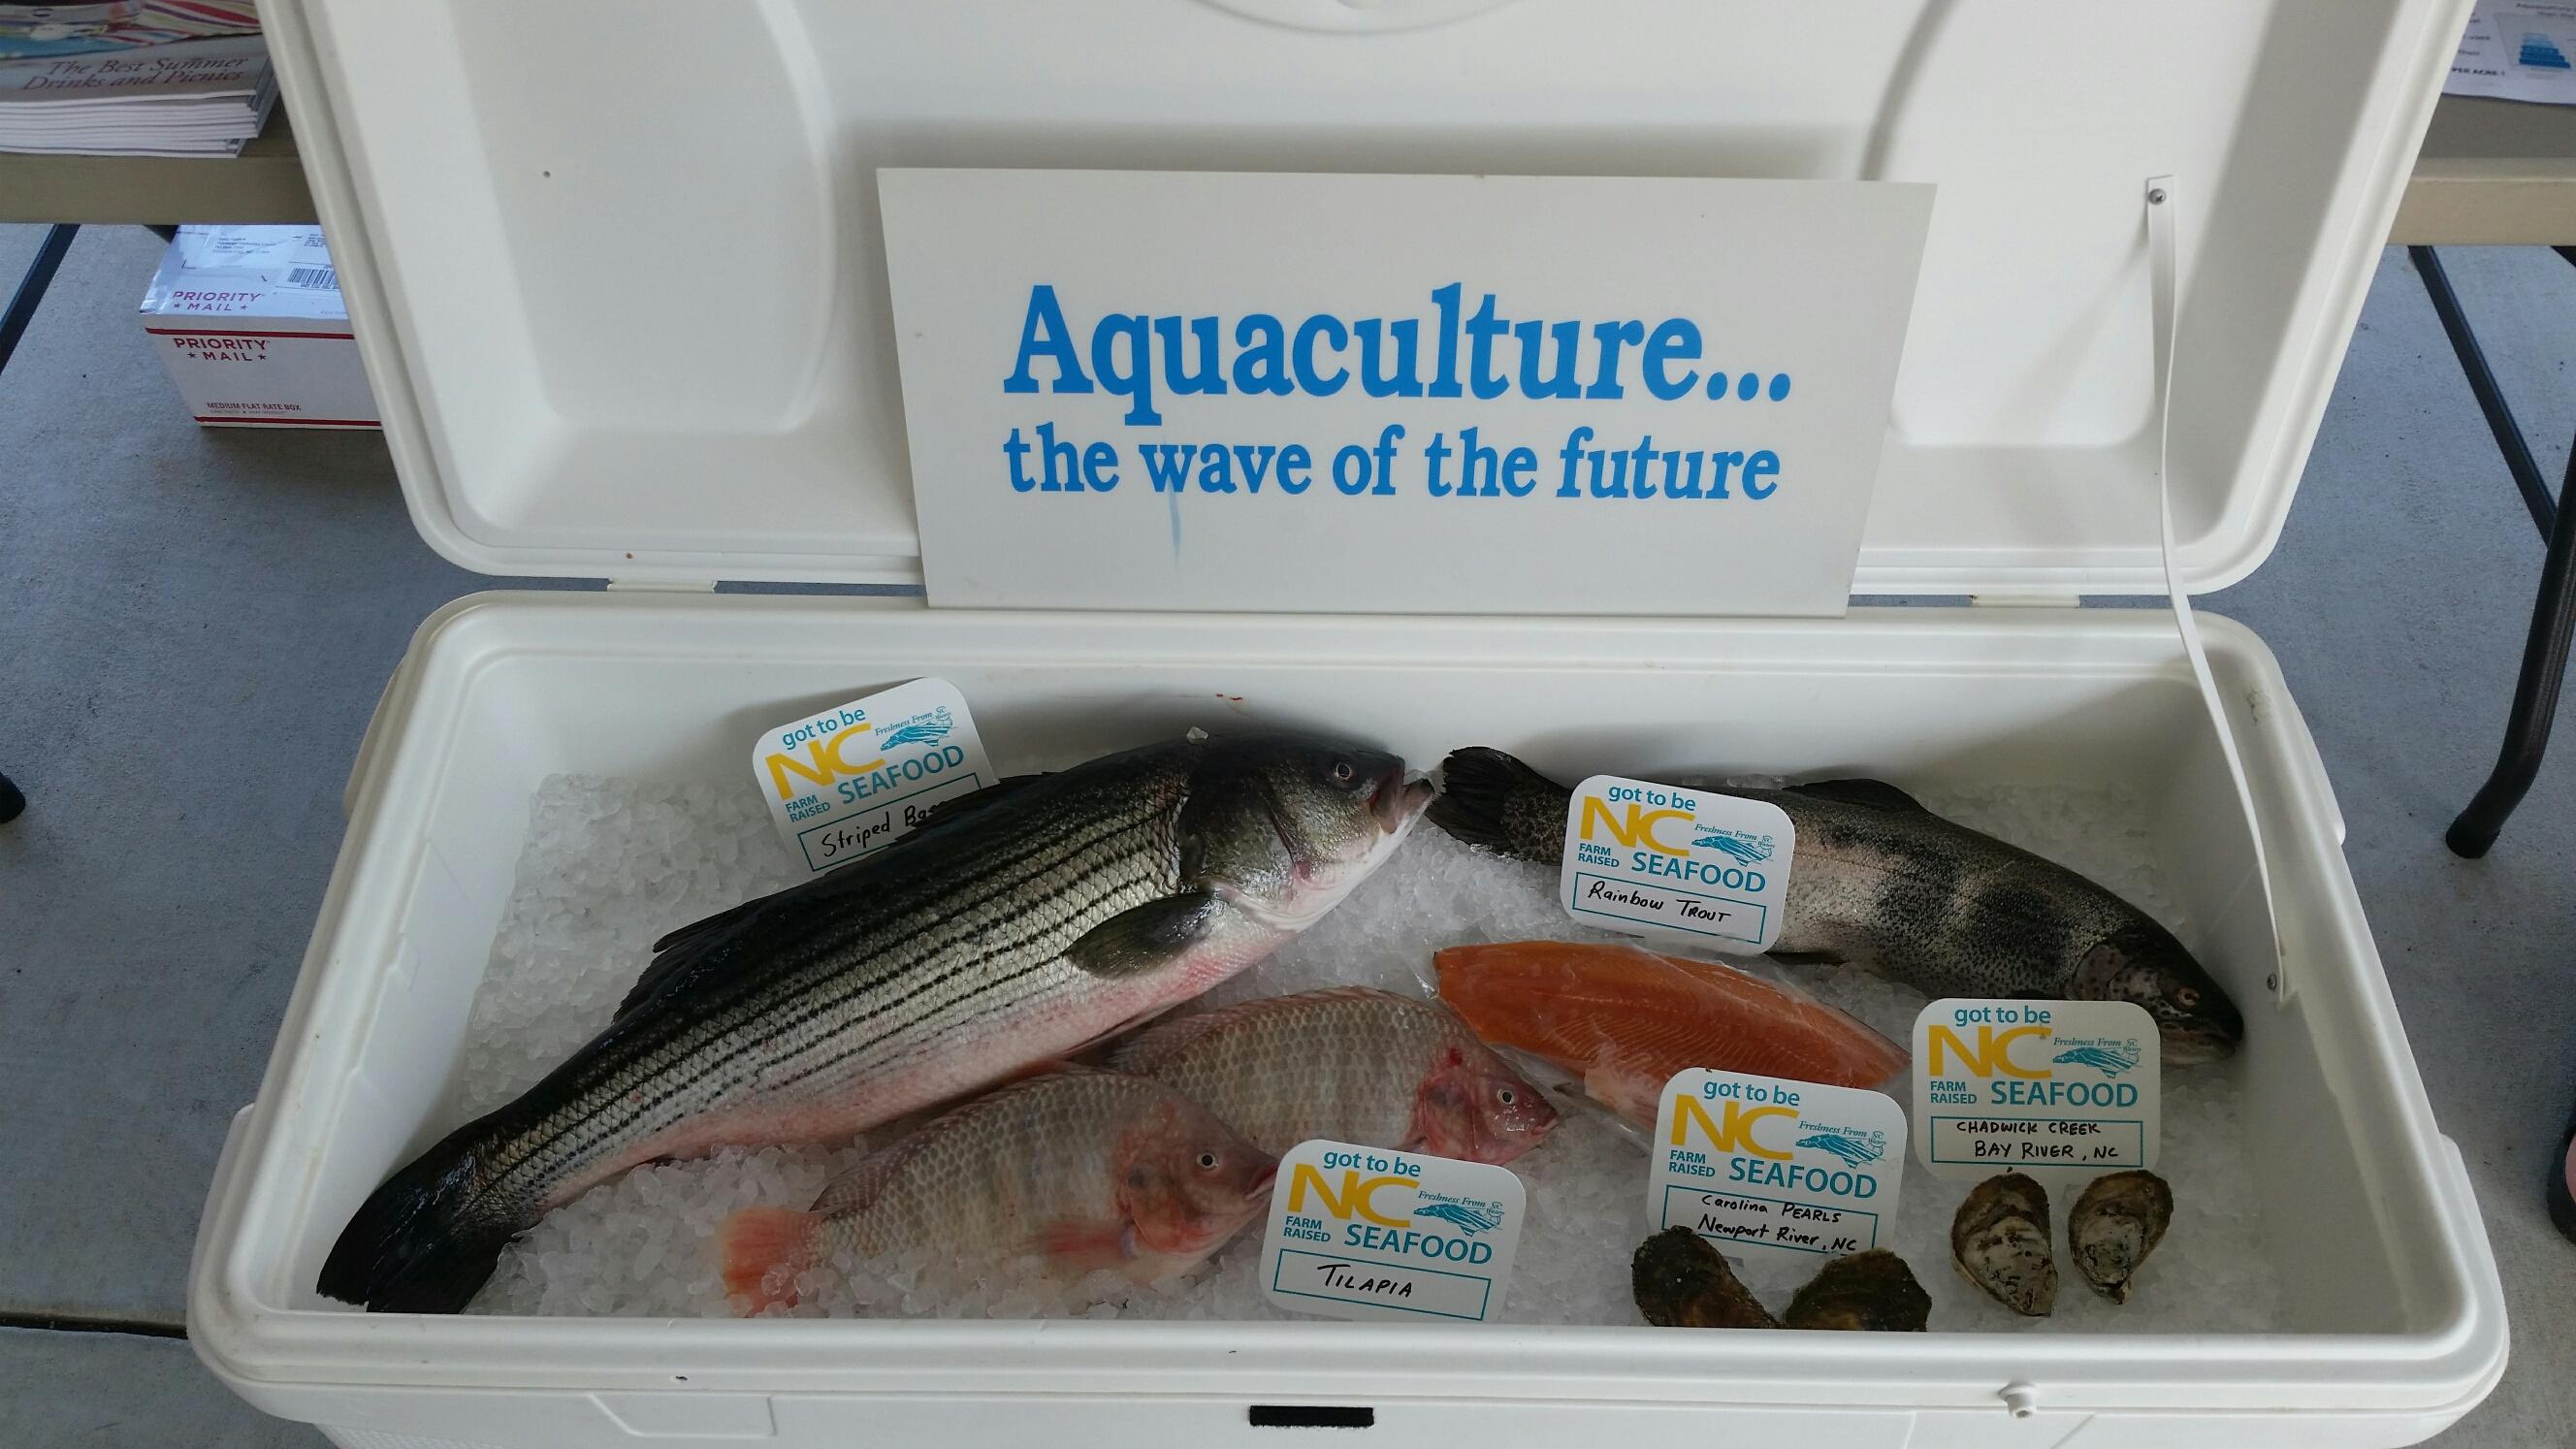 Cultured Seafood Festival in New Bern, N.C.